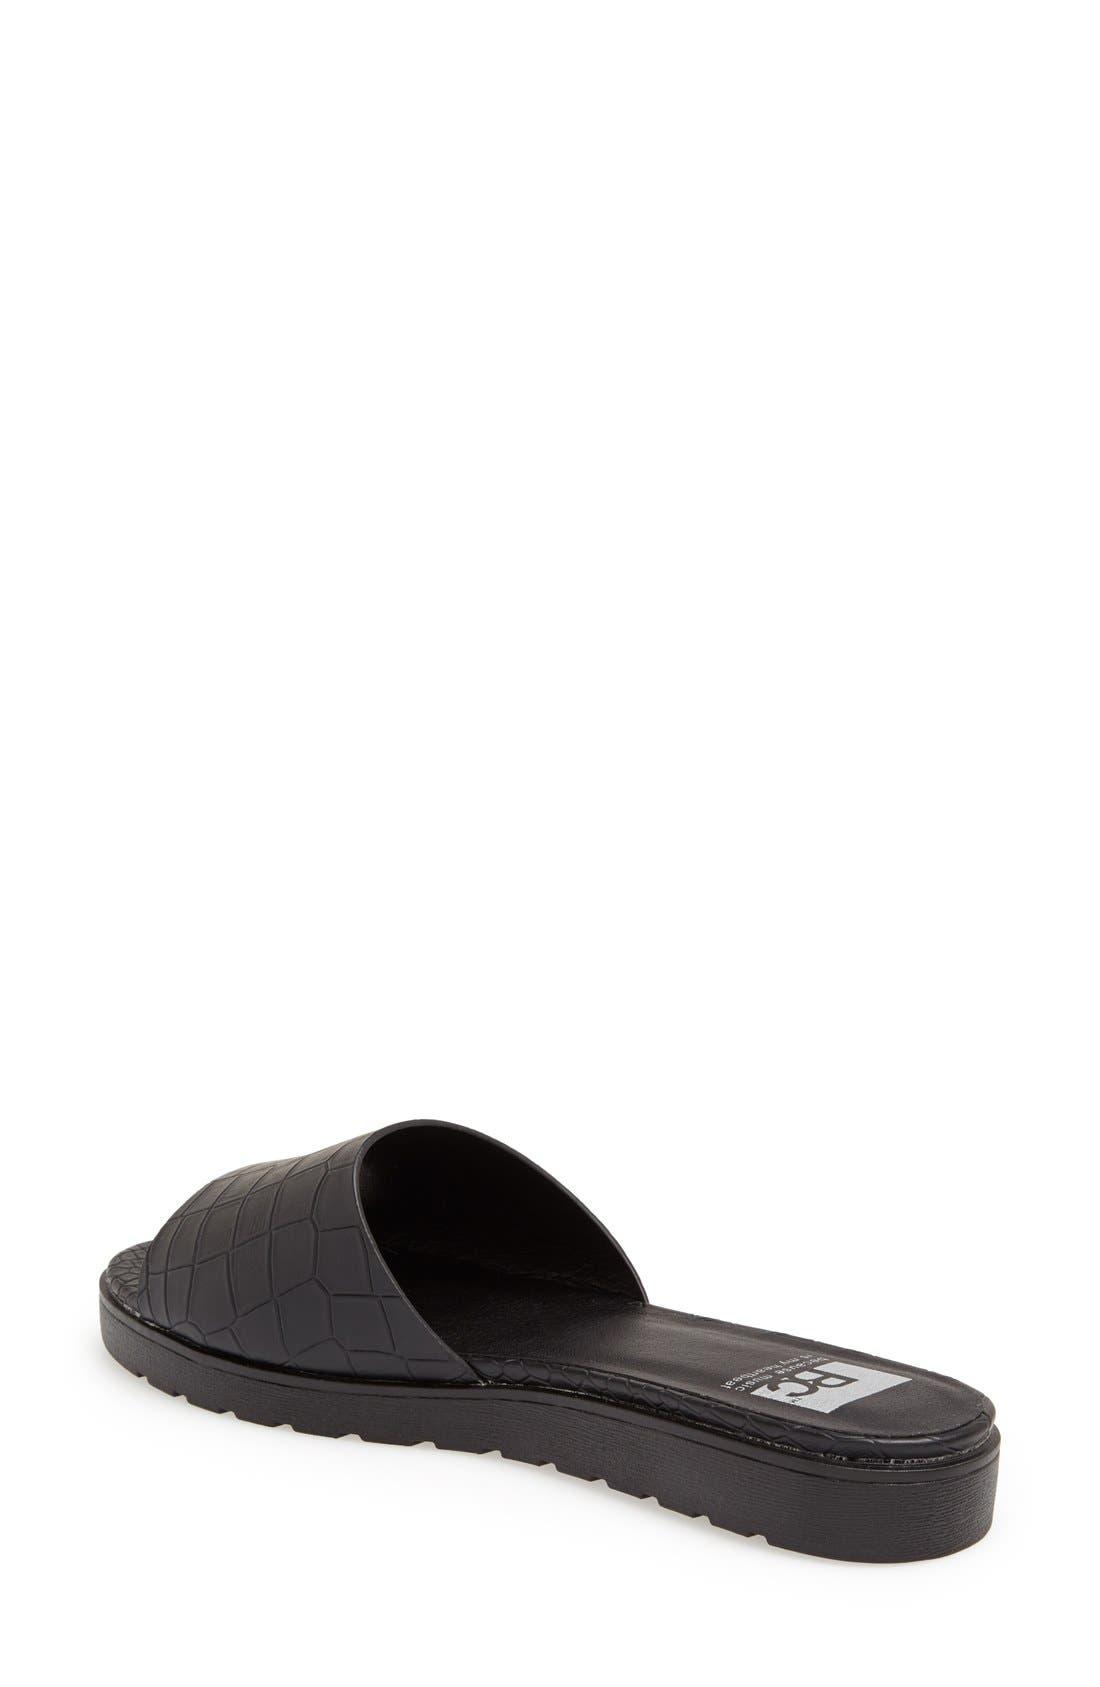 Alternate Image 2  - BC Footwear 'Inspiration' Slide Sandal (Women)